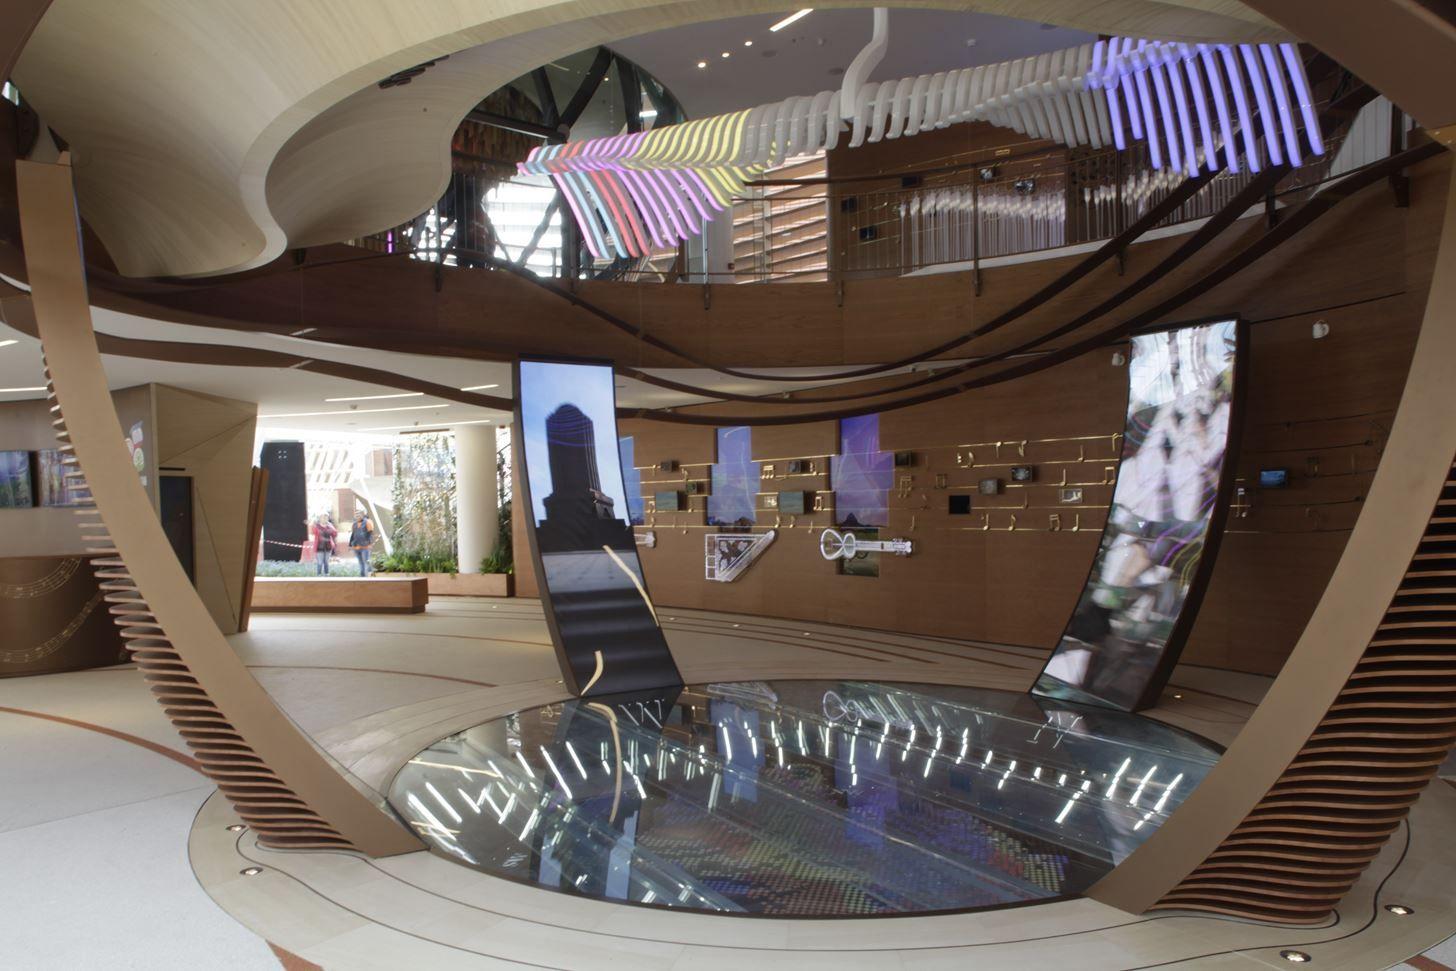 Azerbaijan Pavilion At Expo Milano 2015 - Picture gallery